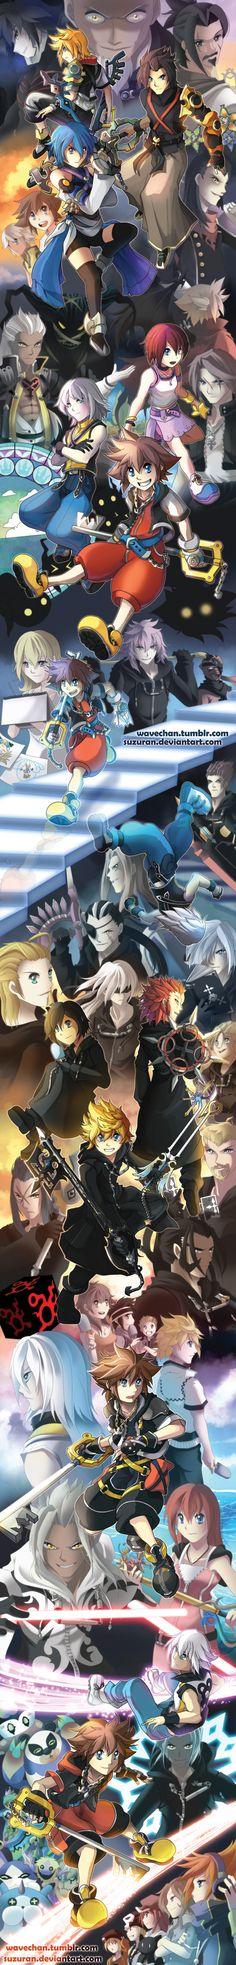 SUPER LONG Kingdom Hearts tribute by suzuran.deviantart.com on @DeviantArt